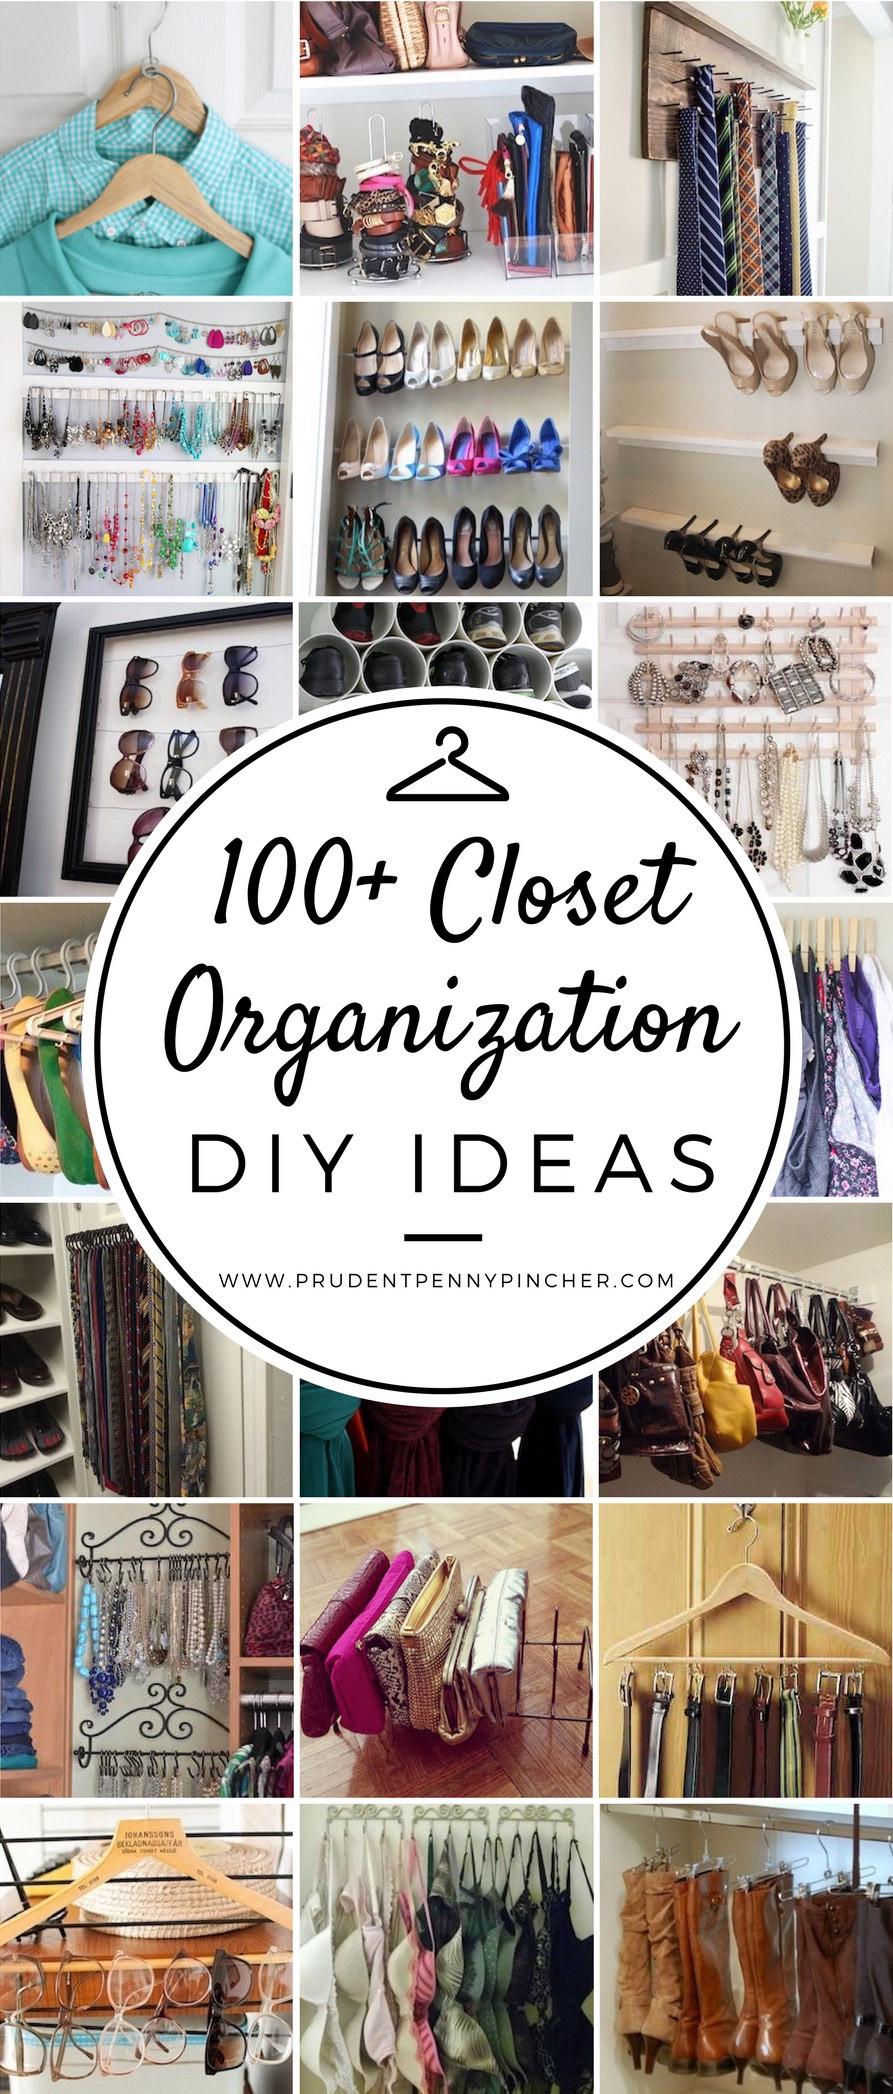 Best ideas about DIY Organize Closet . Save or Pin 100 Best DIY Closet Organization Ideas Prudent Penny Pincher Now.